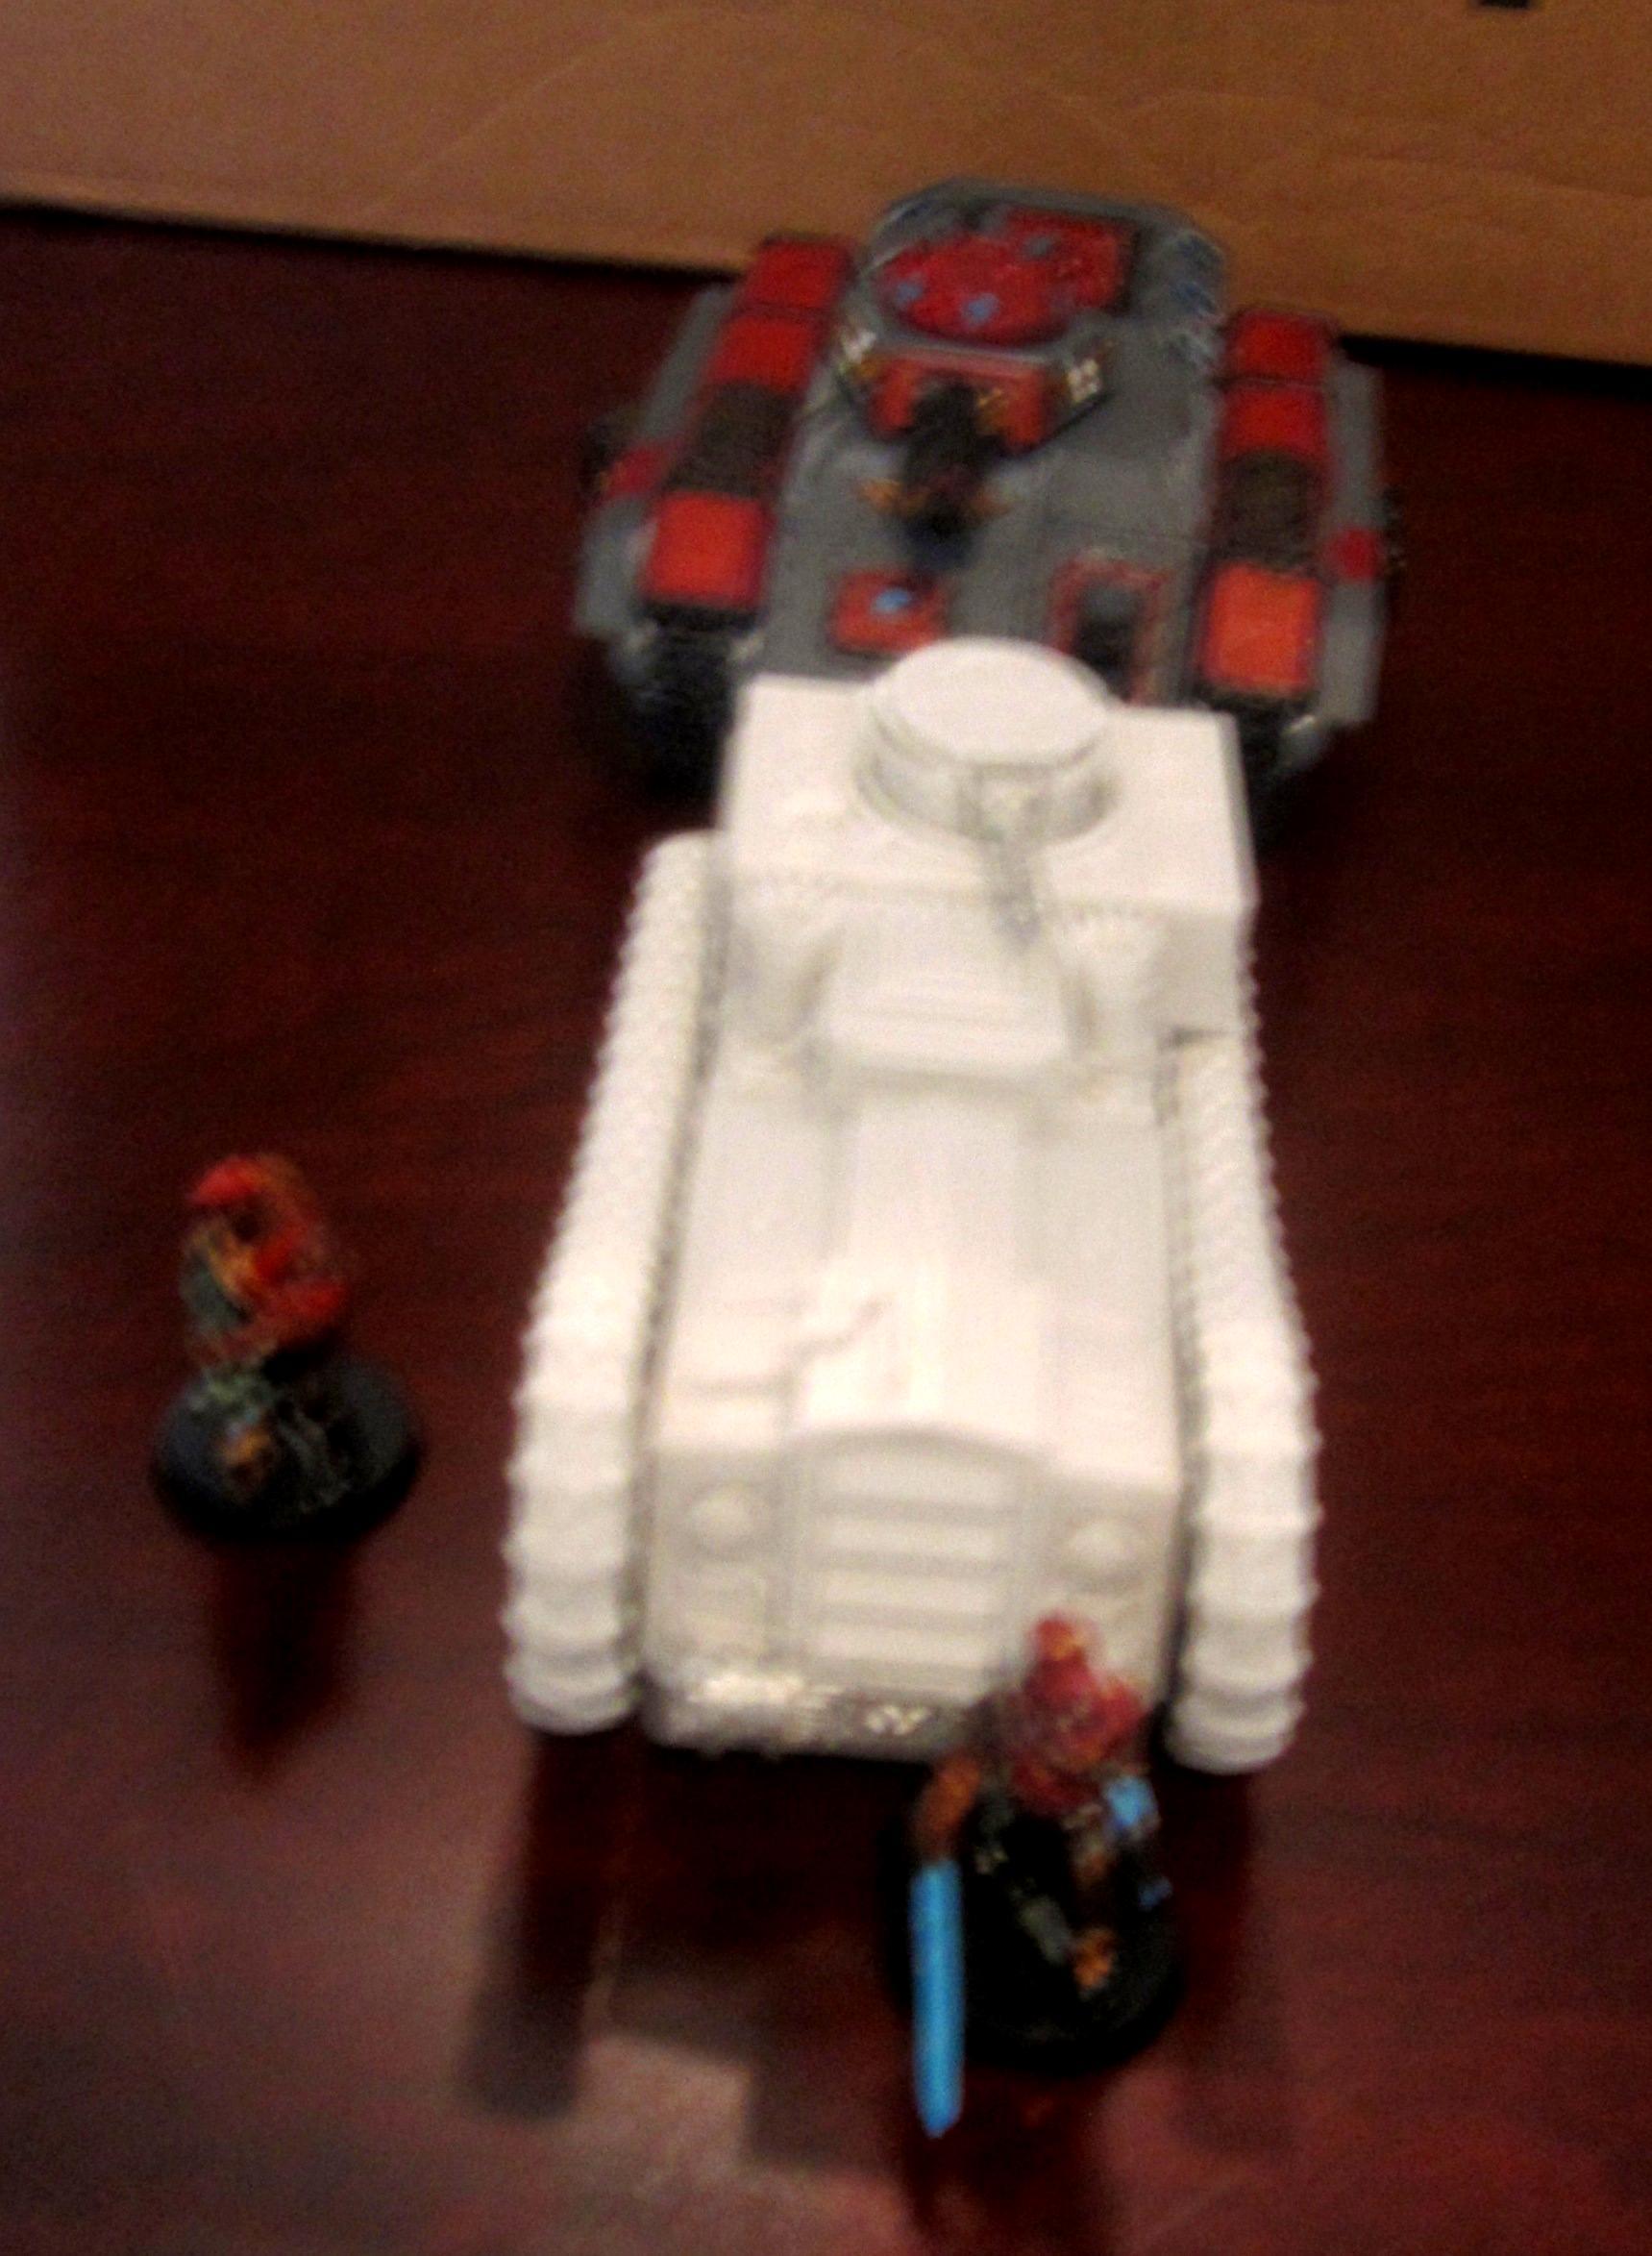 Armored Car, Dystopian Legions, Patriot